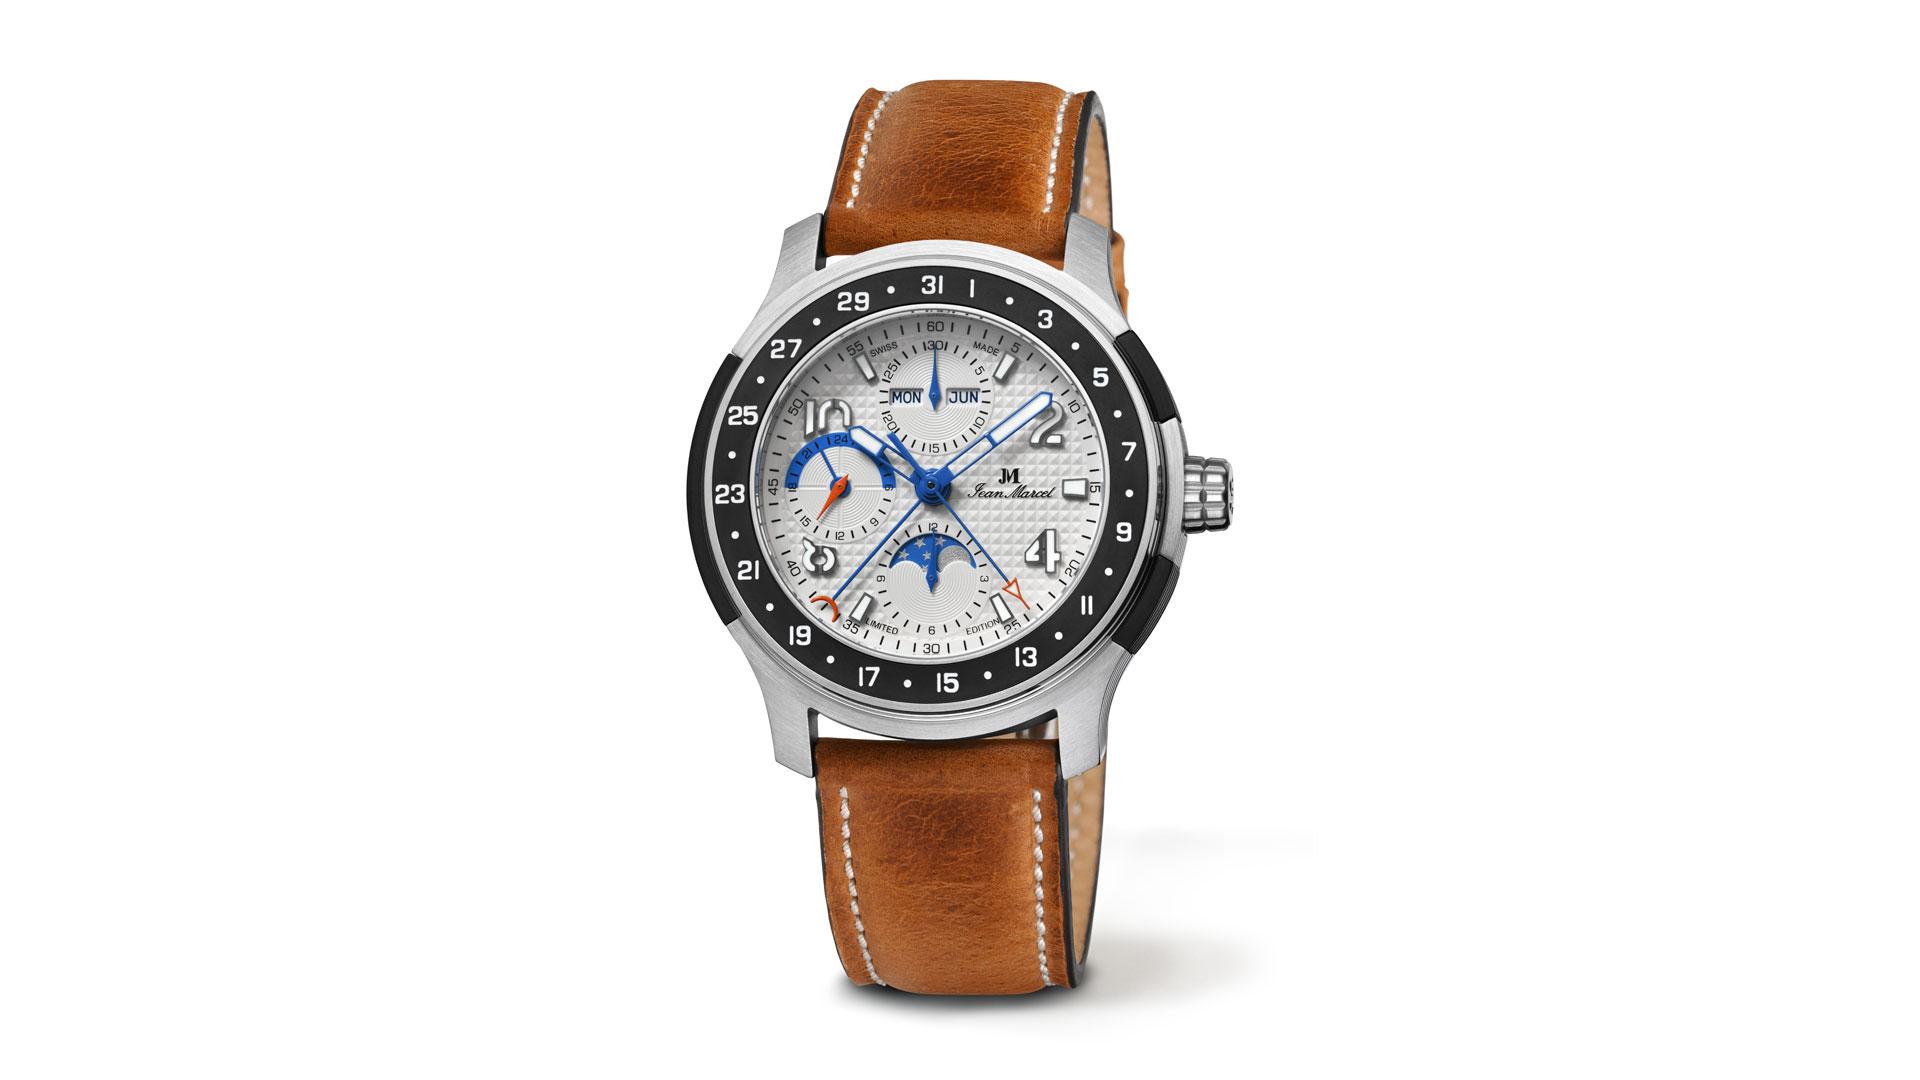 Jean Marcel Splendor Chronograph Clou de Paris